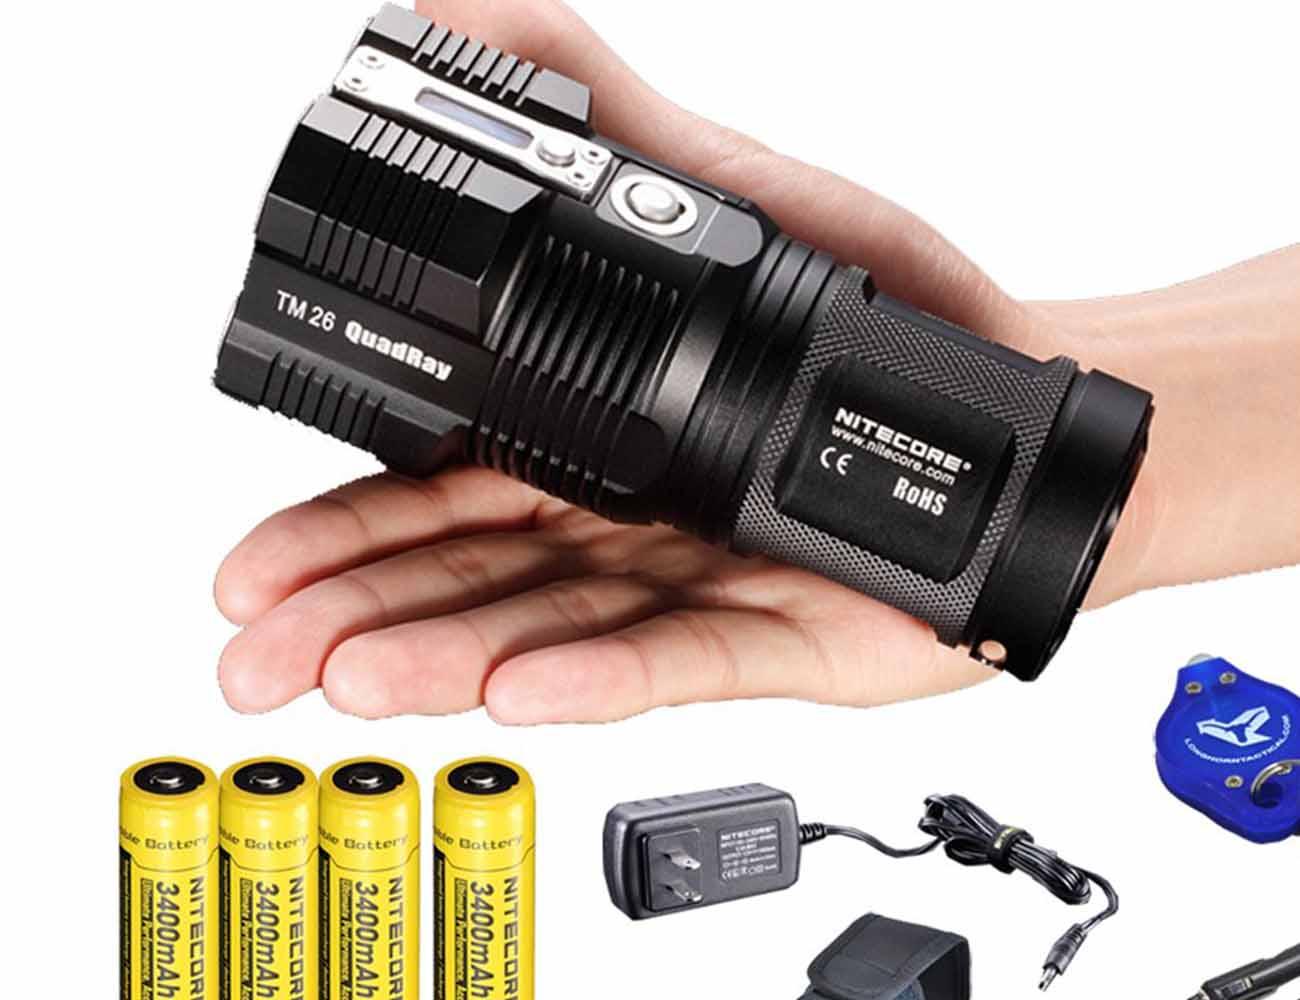 NiteCore TM26 Tiny Monster Flashlight